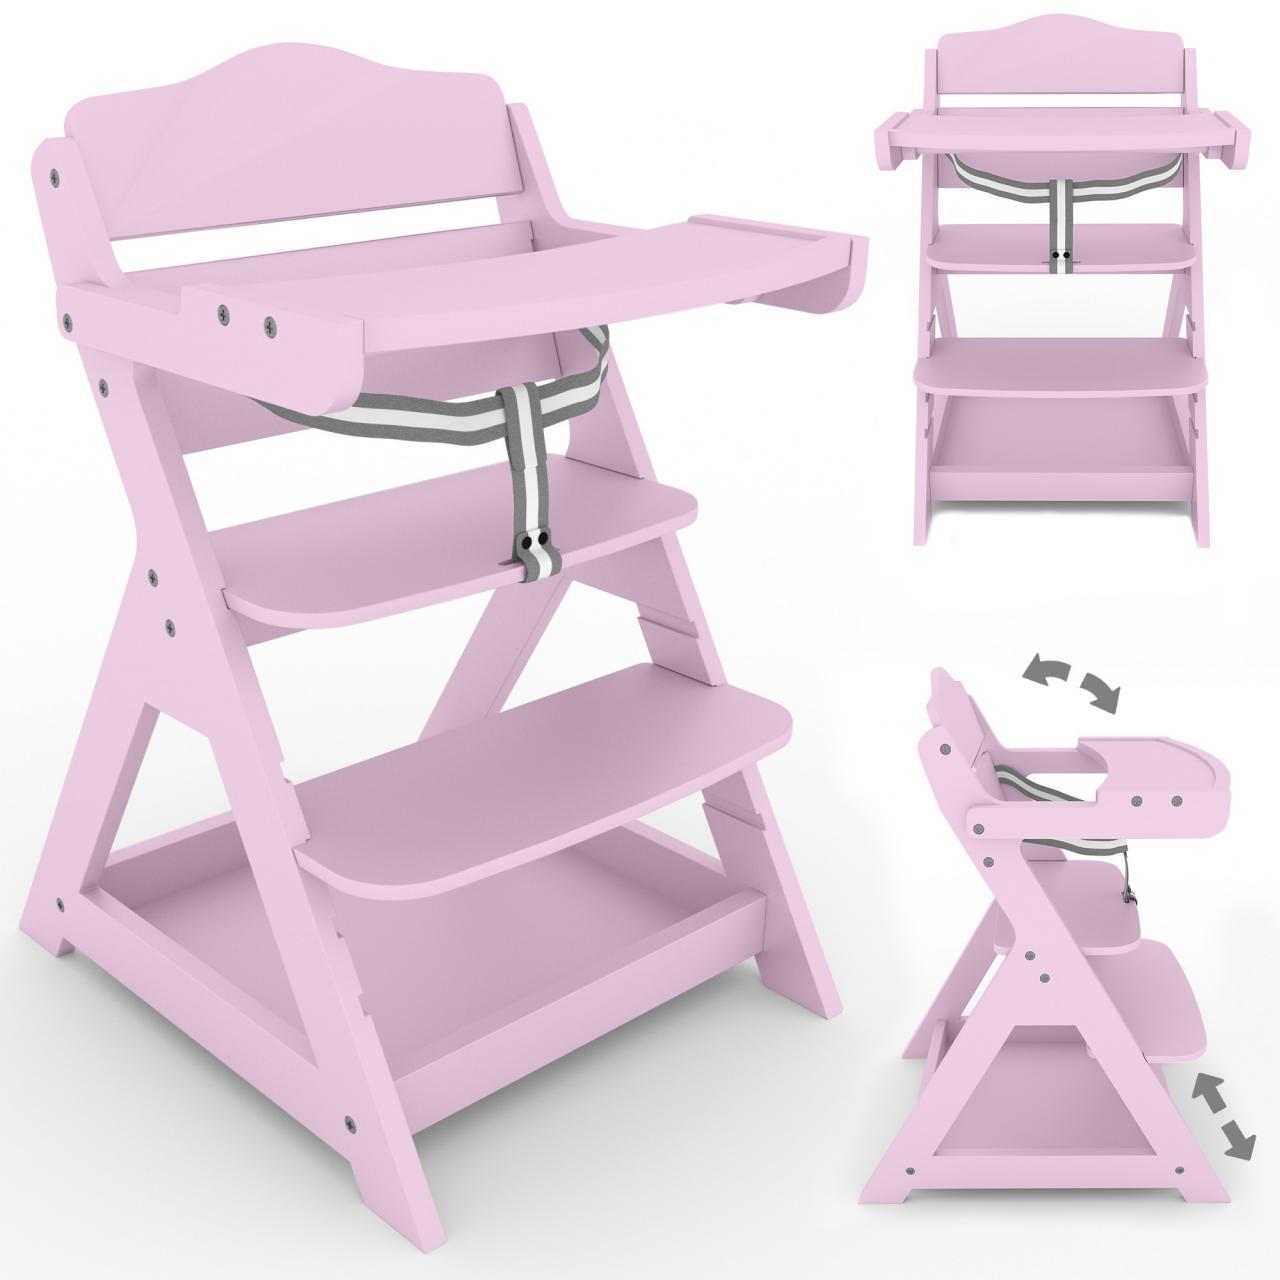 2-in-1-Treppenhochstuhl-Kinderhochstuhl-Holz-Hochstuhl-Kinderstuhl-Babyhochstuhl